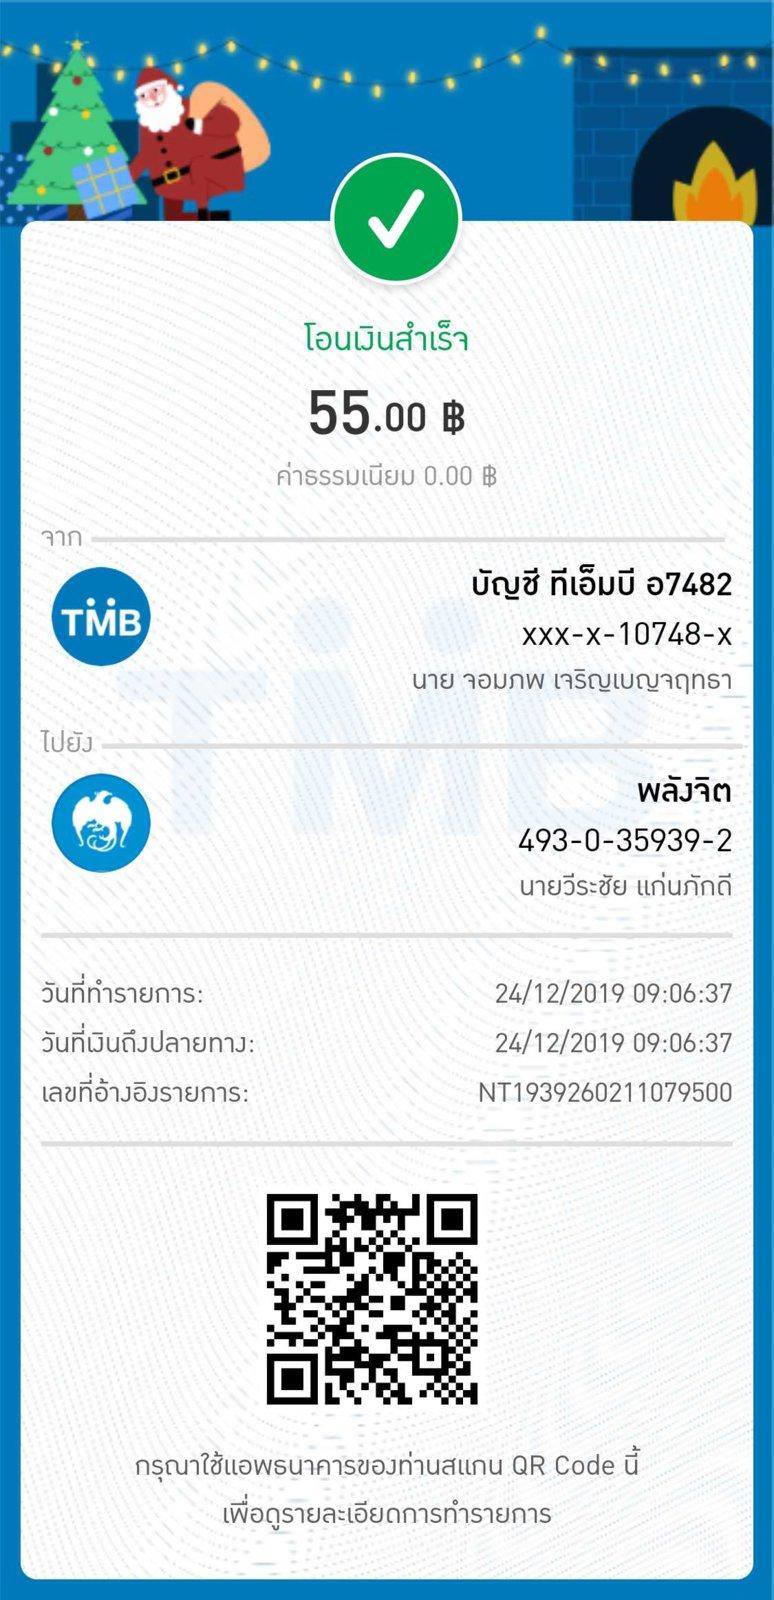 Transfer-24-12-2019 09-07-01.jpg